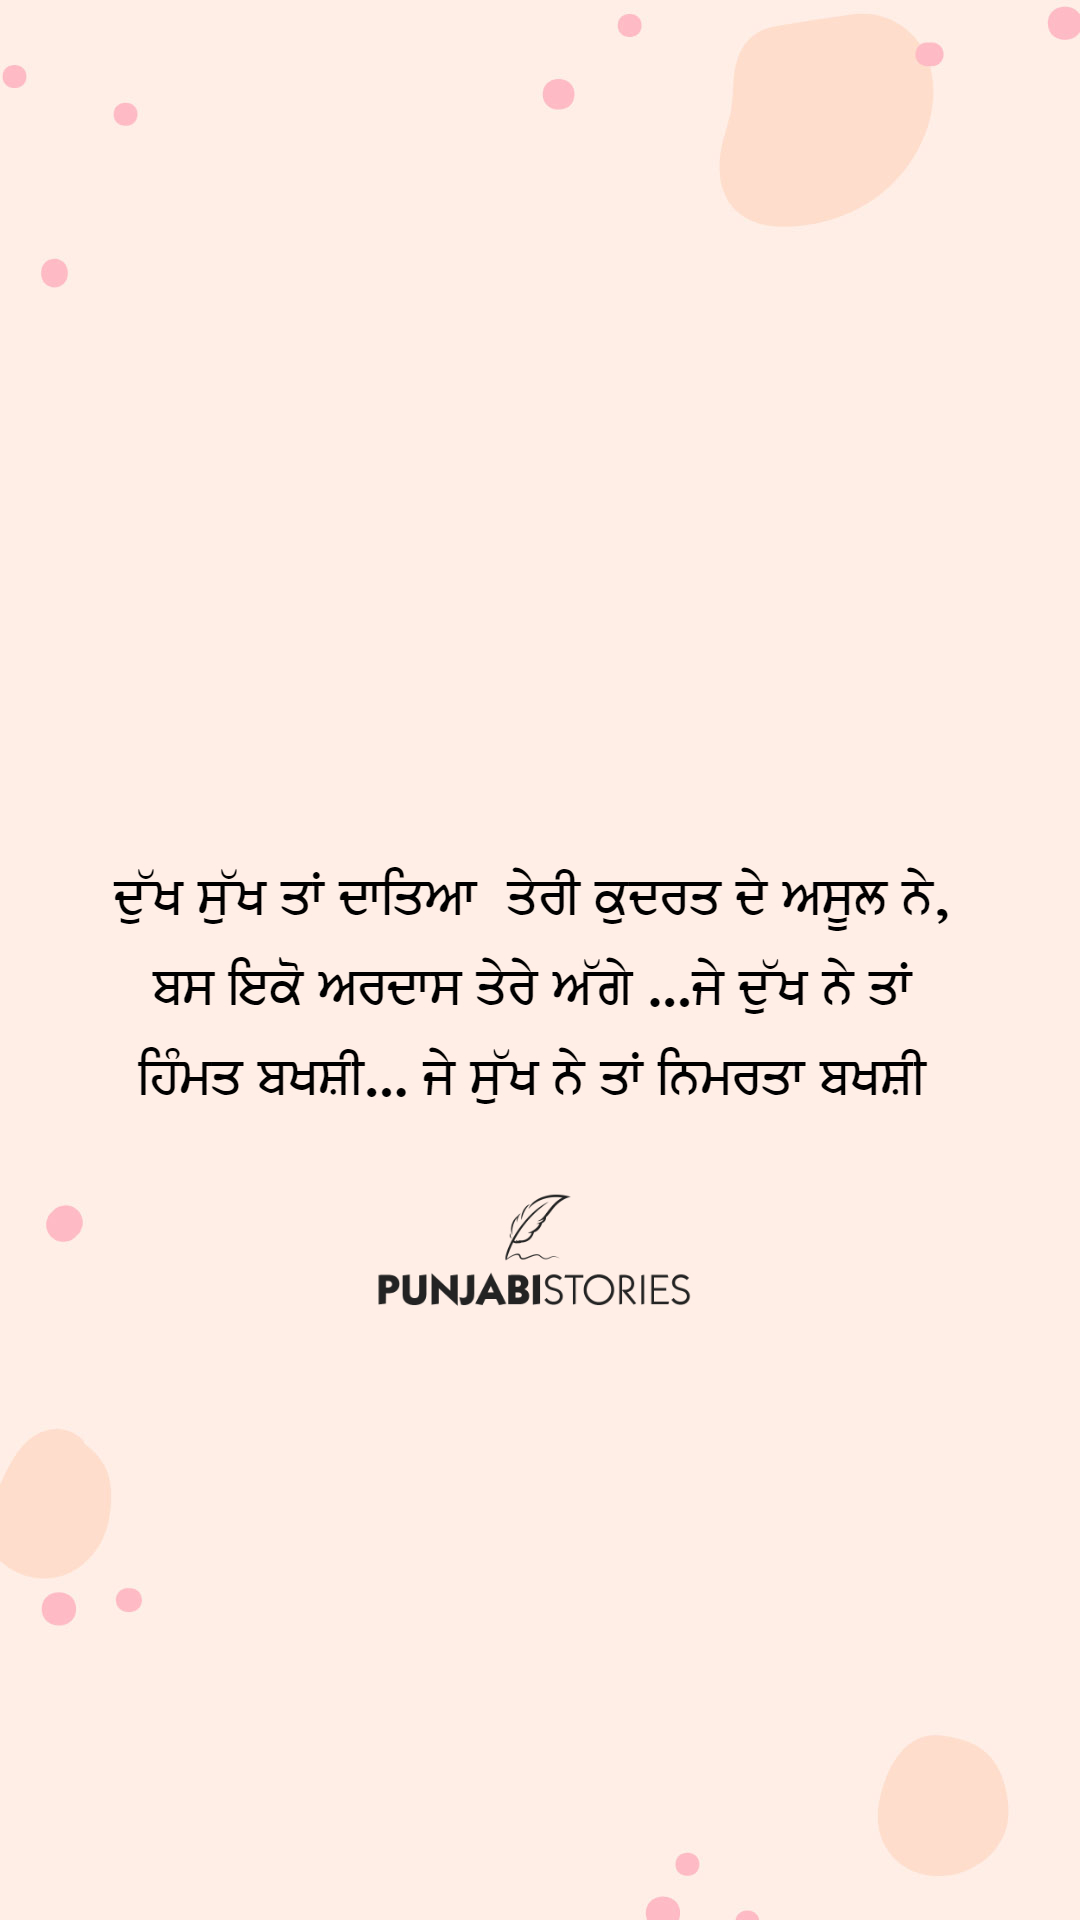 whatsapp status punjabi, gurbani written lines in punjabi